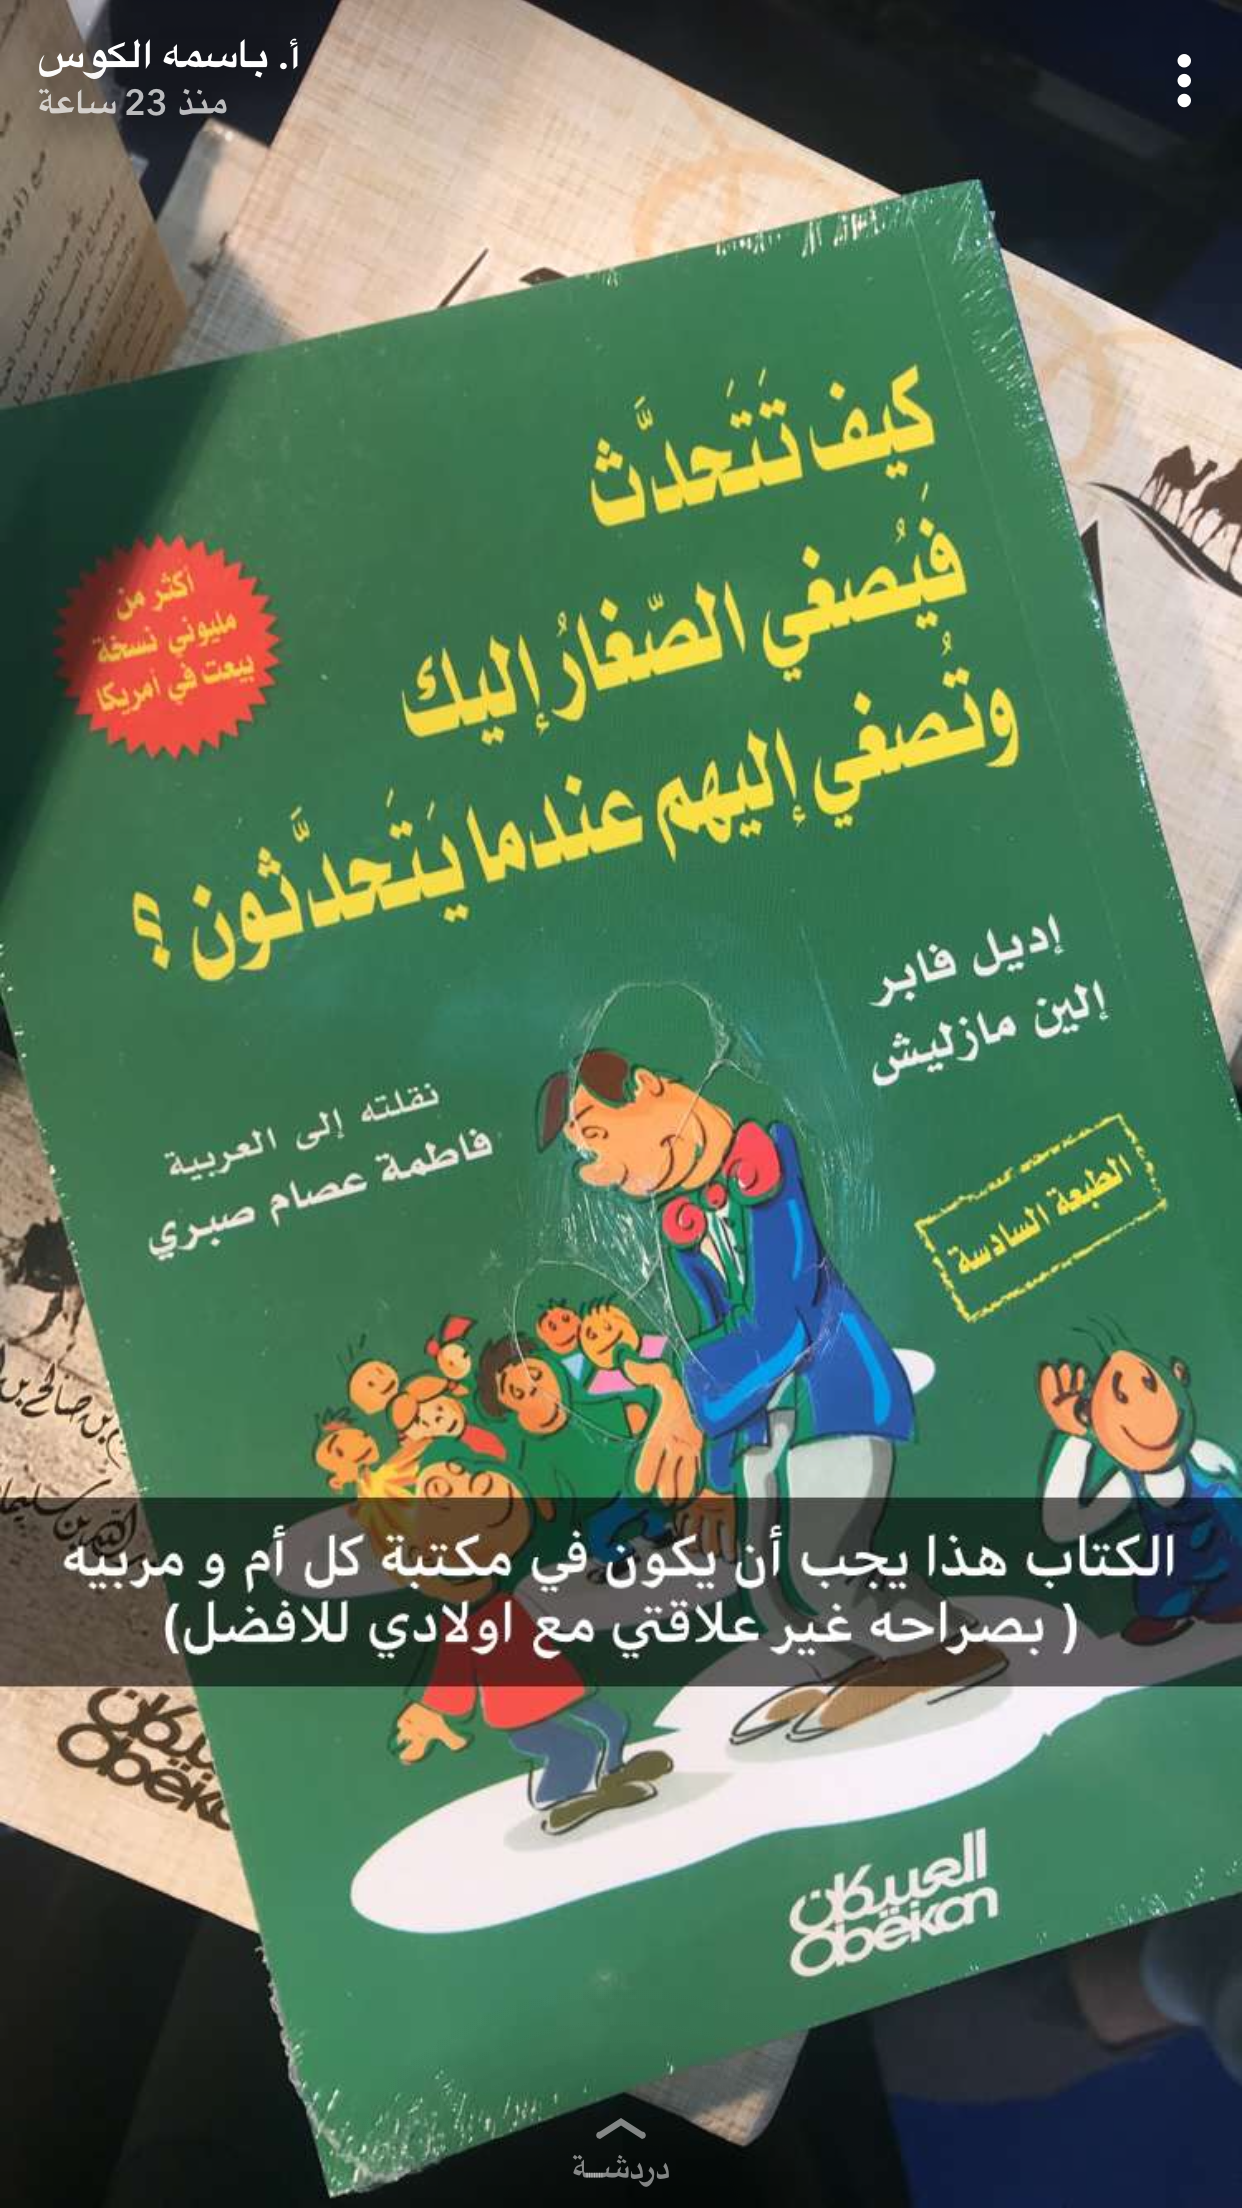 Pin By Noor Hossam On كتب Books Inspirational Books Arabic Books